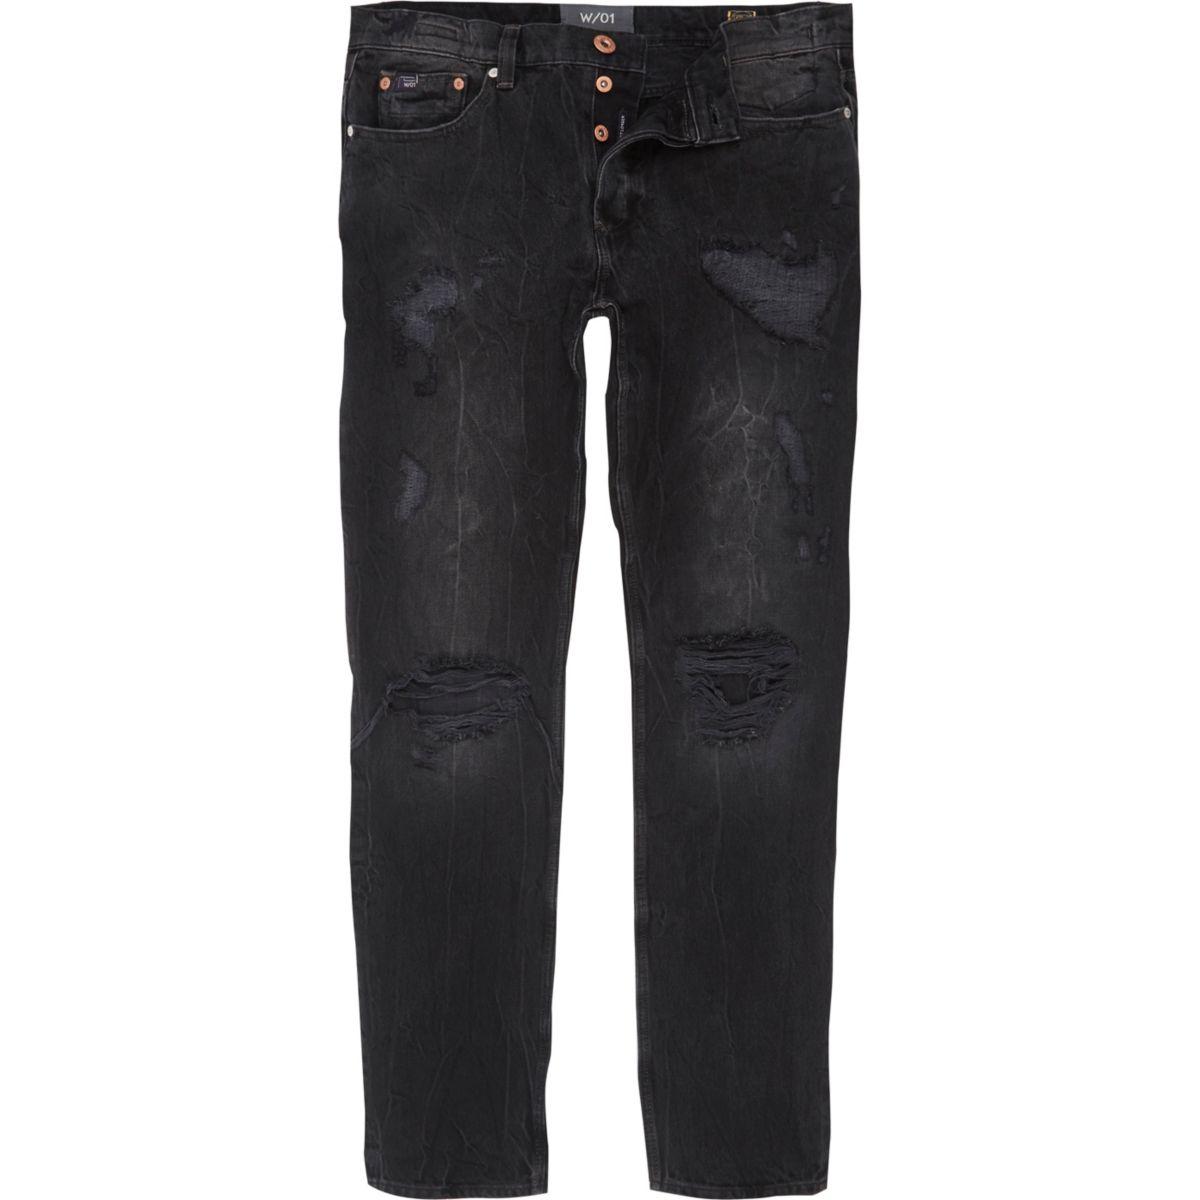 Black wash ripped fade Sid skinny warp jeans